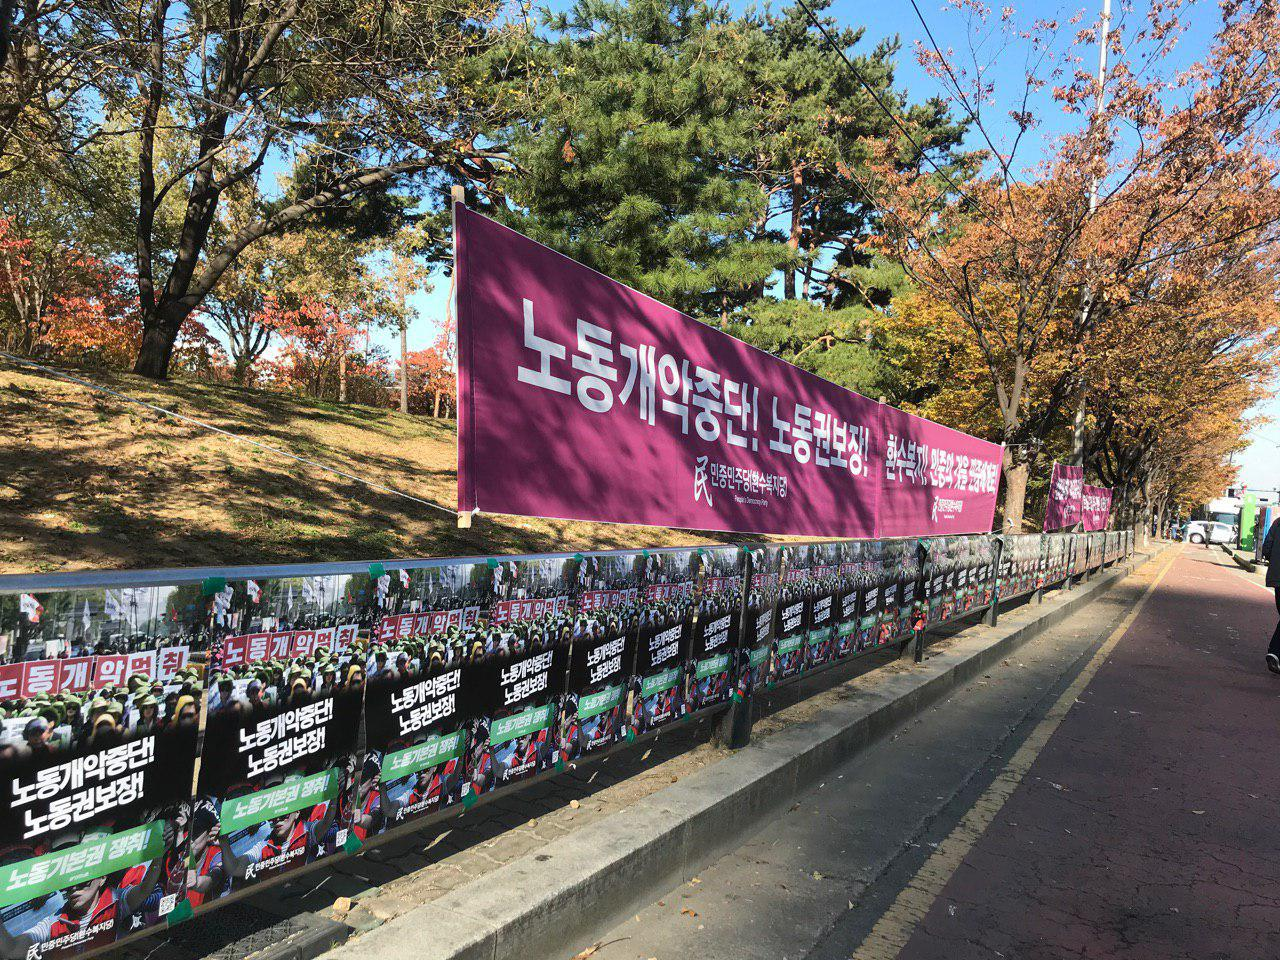 photo_2019-11-09_16-27-40.jpg